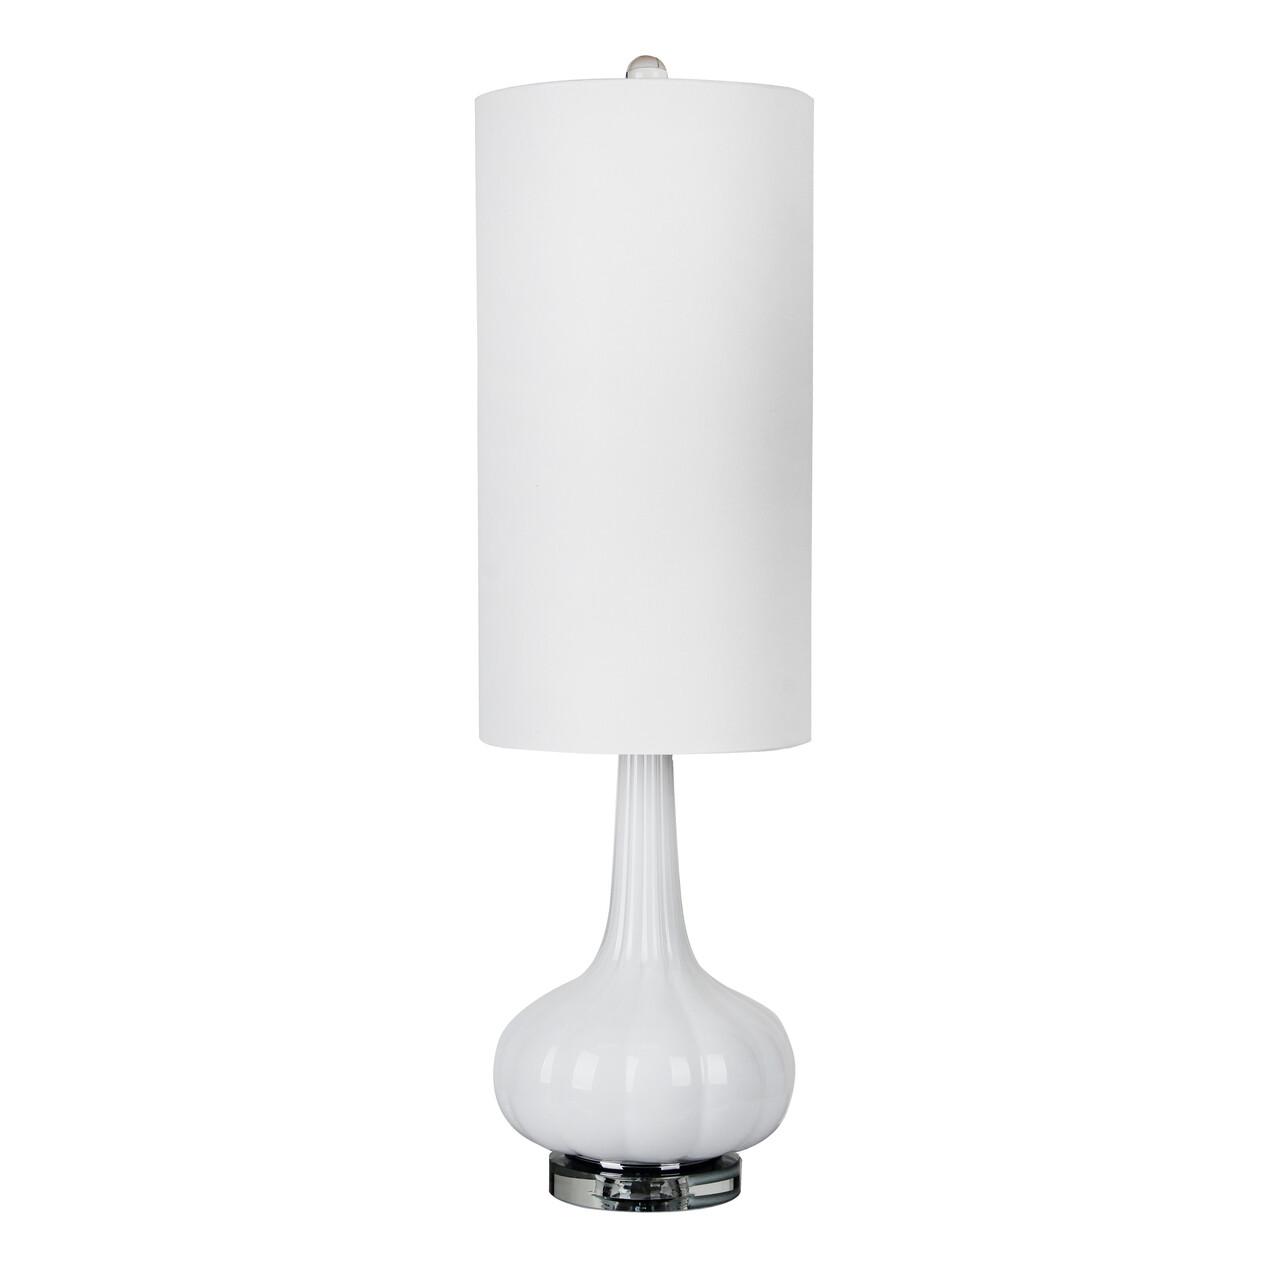 SB Genie Bottle Table Lamp Small